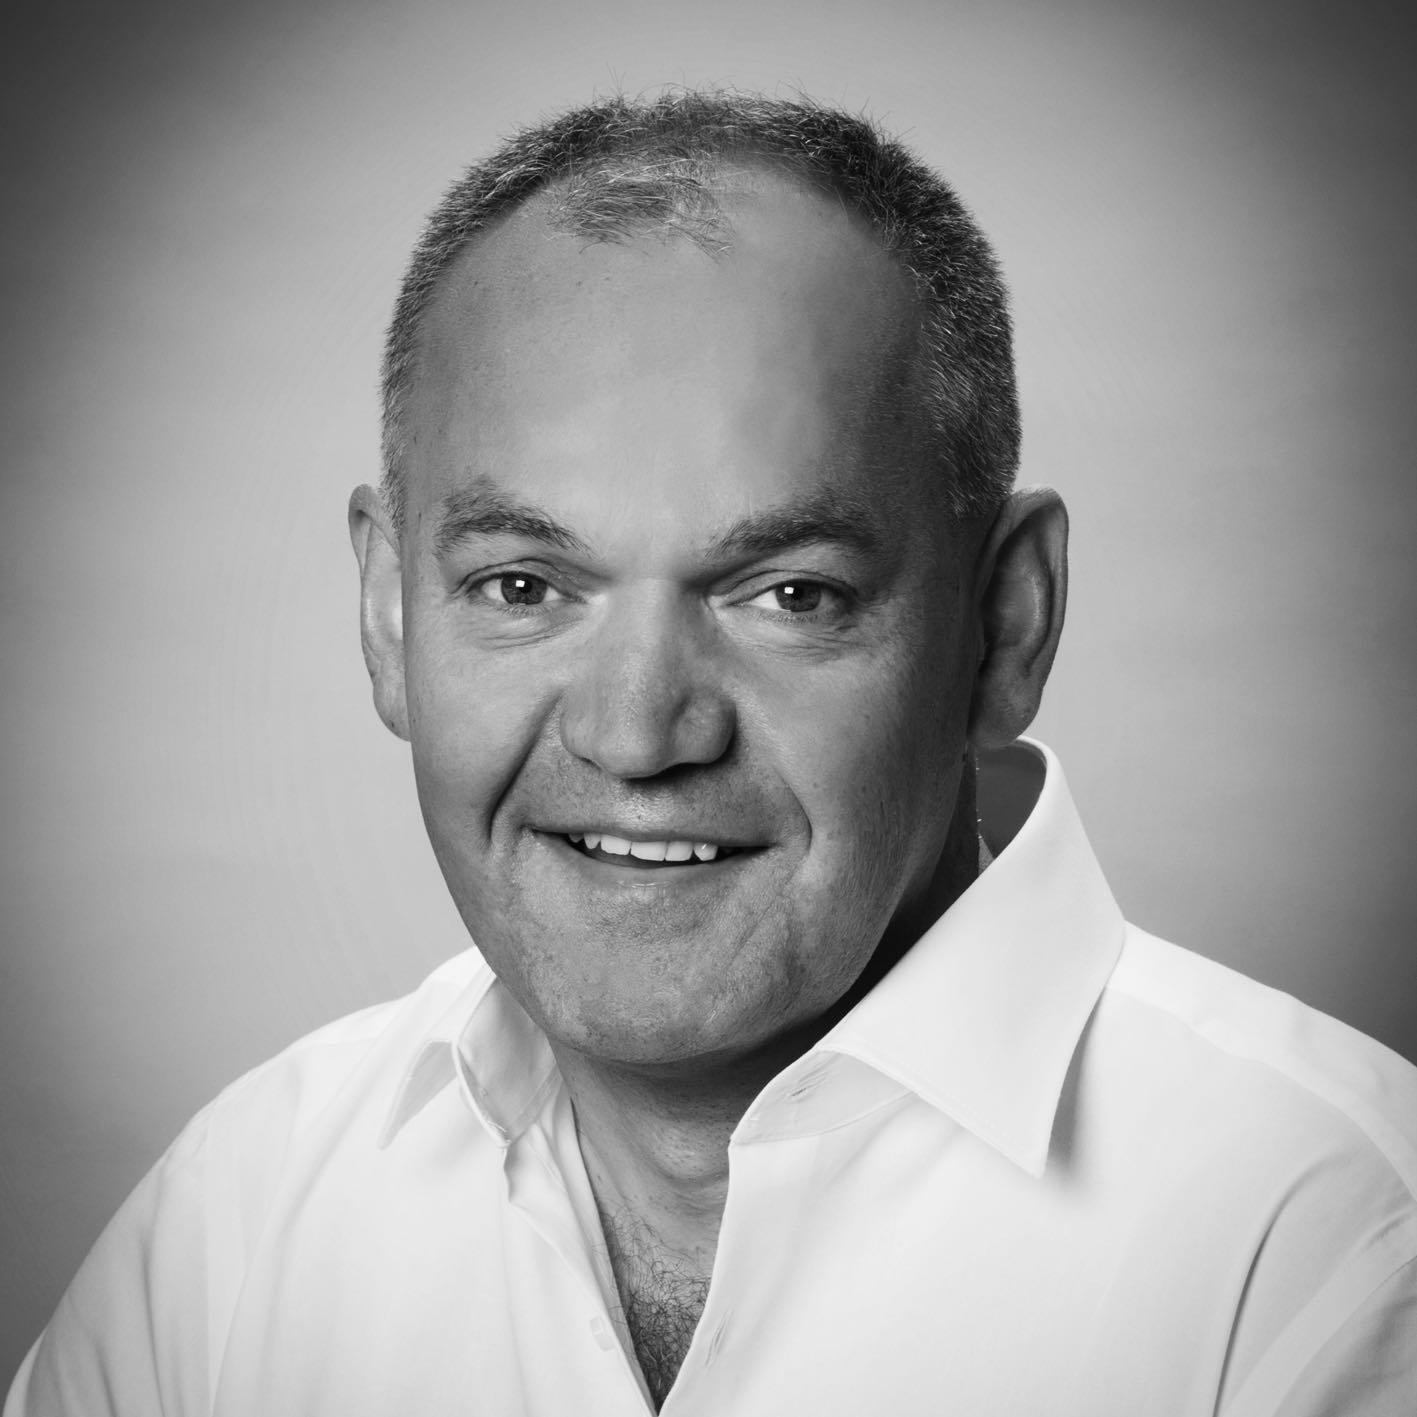 Dr Phil Brennan, Director, Romero Institute, Waterford